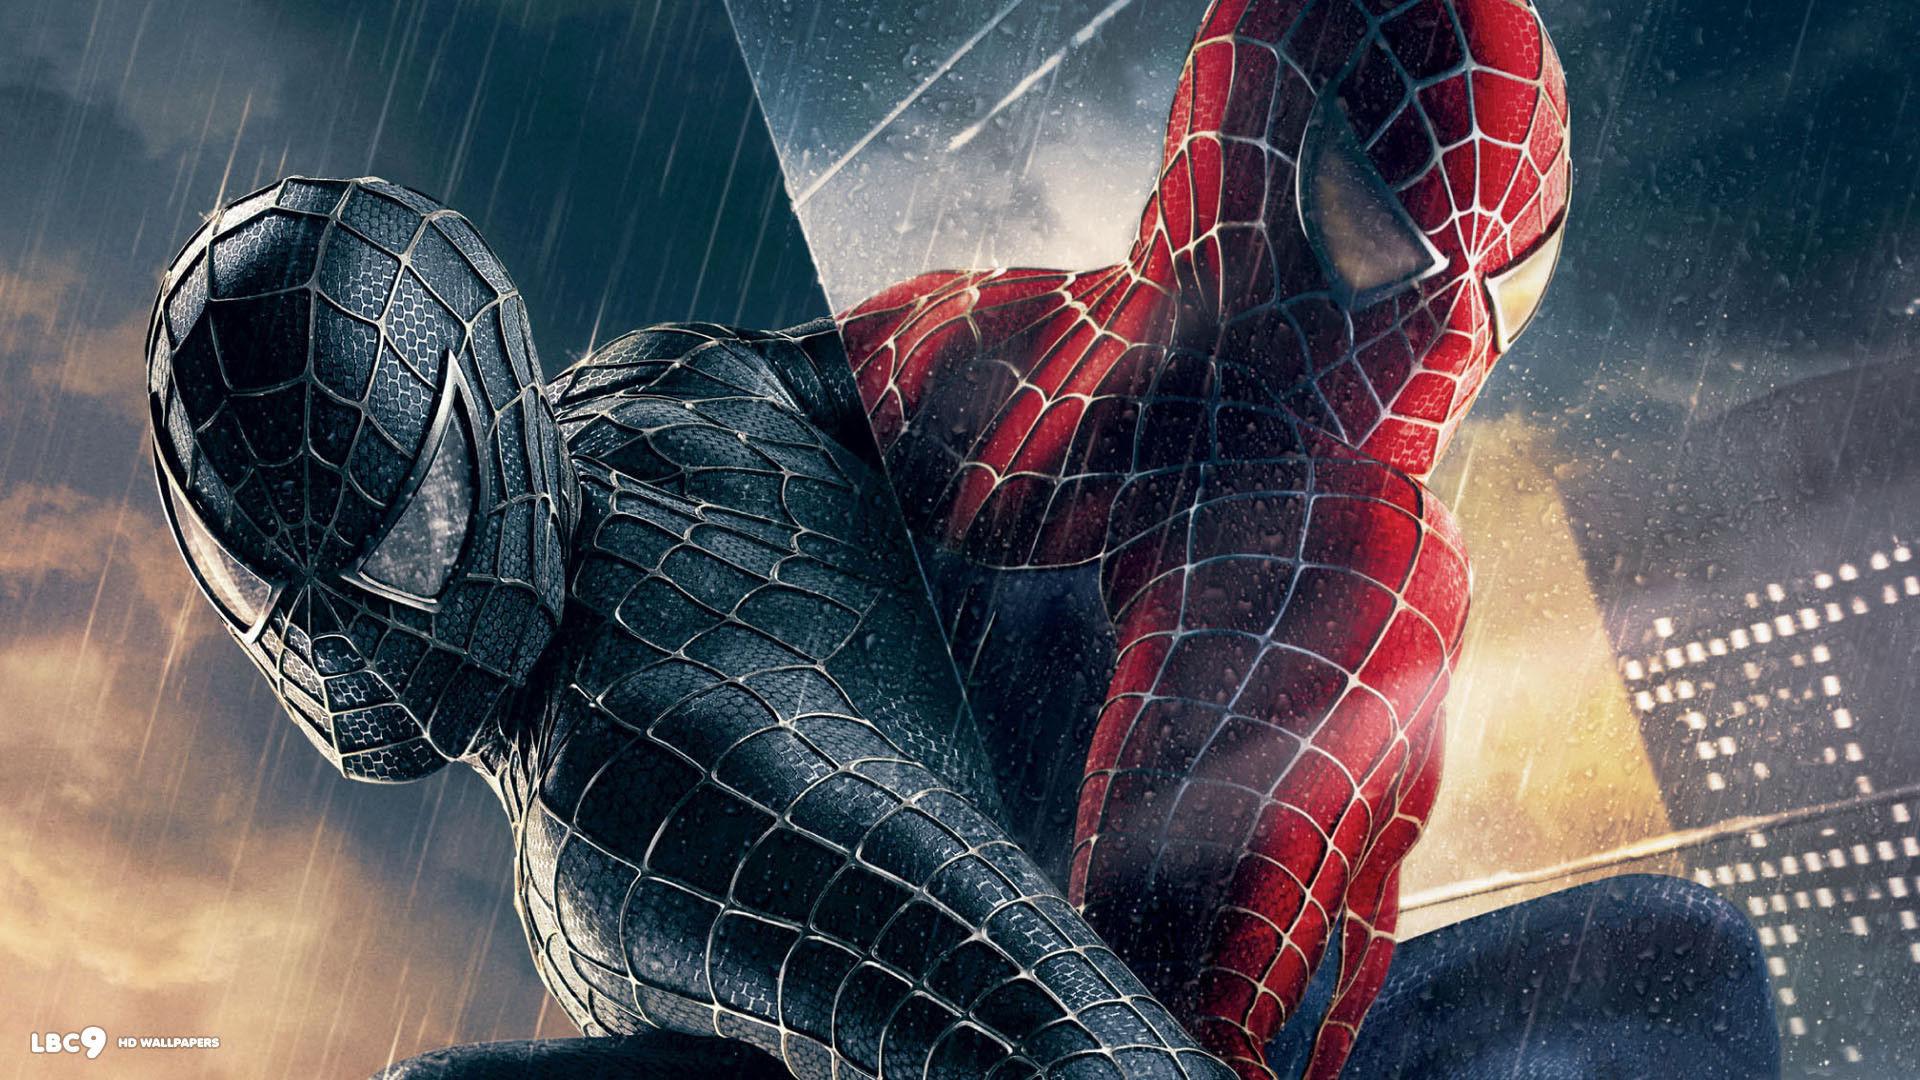 Spiderman 3 Hd Wallpapers